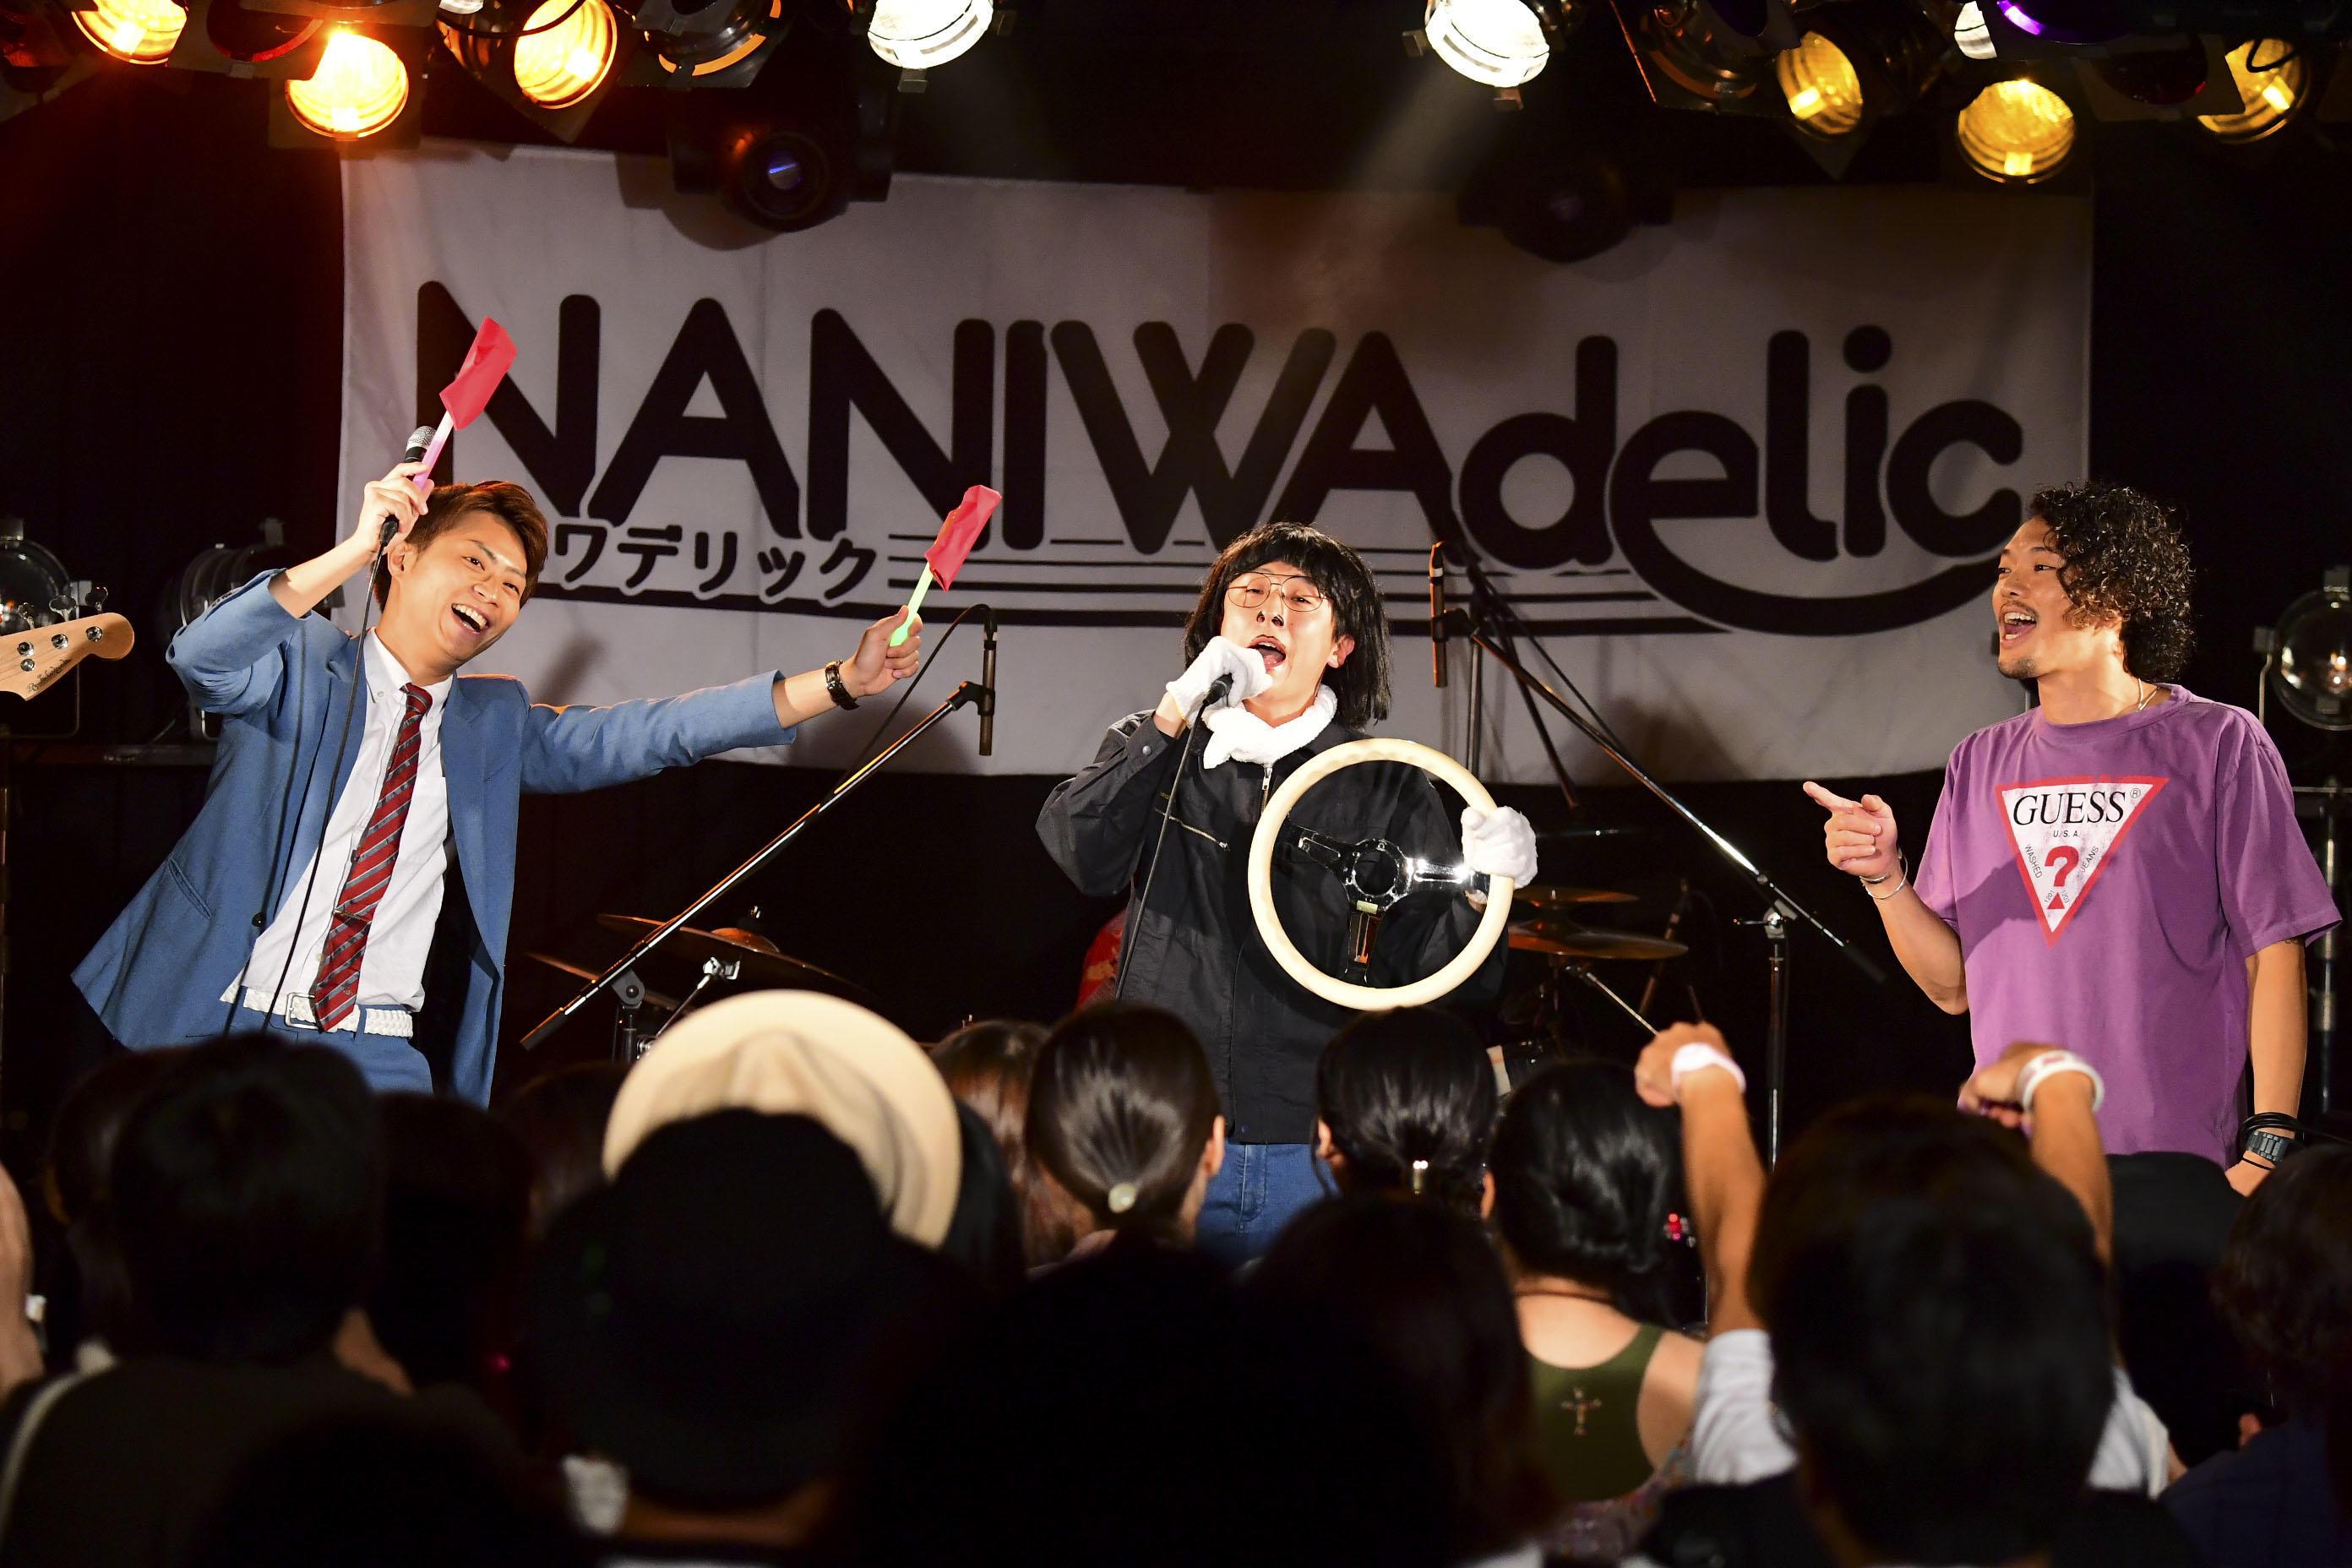 http://news.yoshimoto.co.jp/20170802093515-622a42493c0b29029341ff1a7e29f57c4dfd4465.jpg